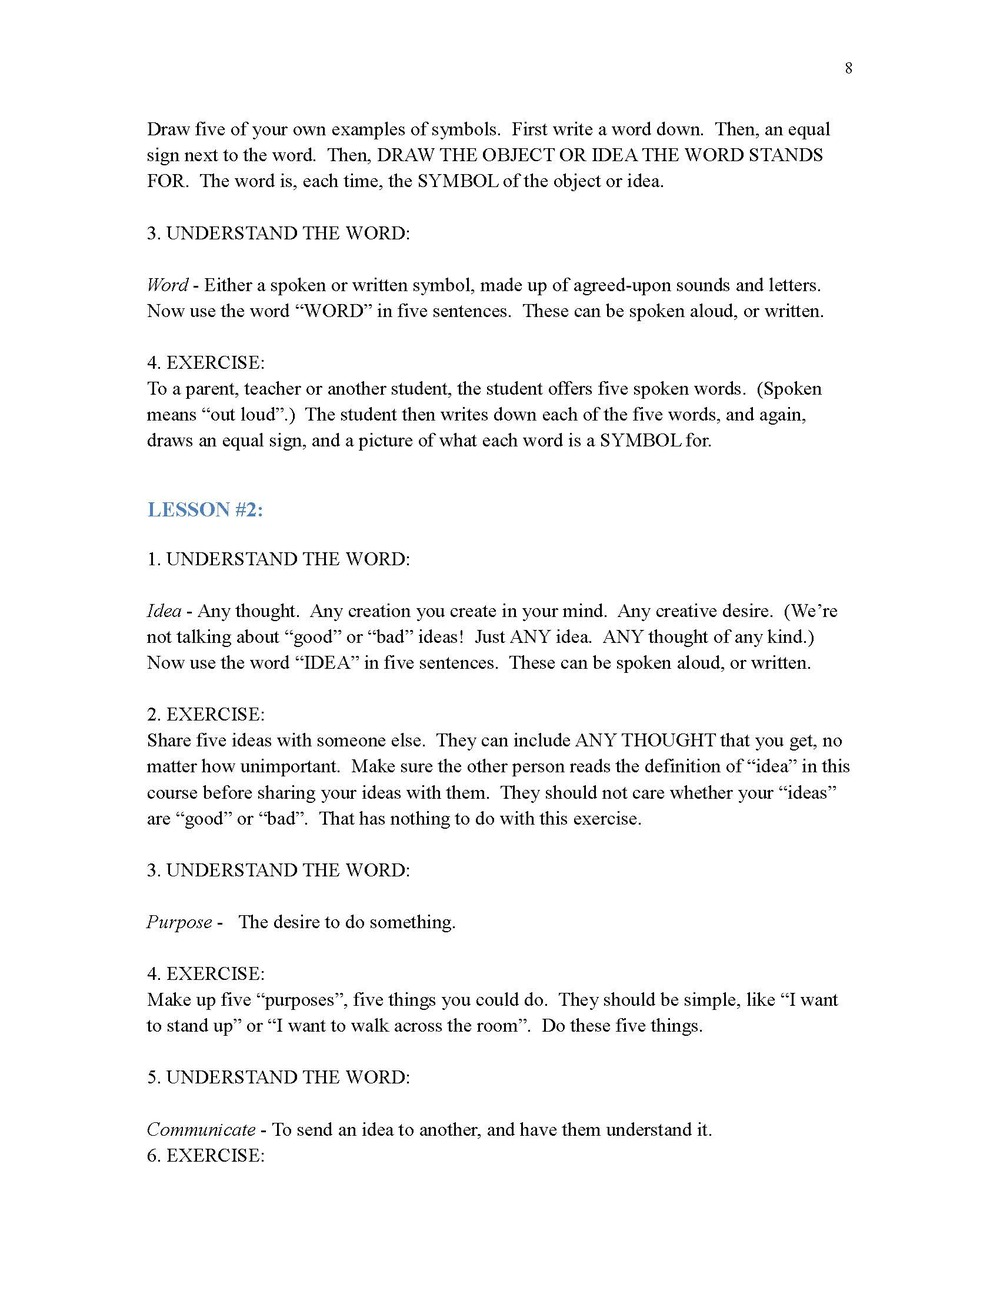 Samples Step 3-4 Creative Writing 1_Page_09.jpg